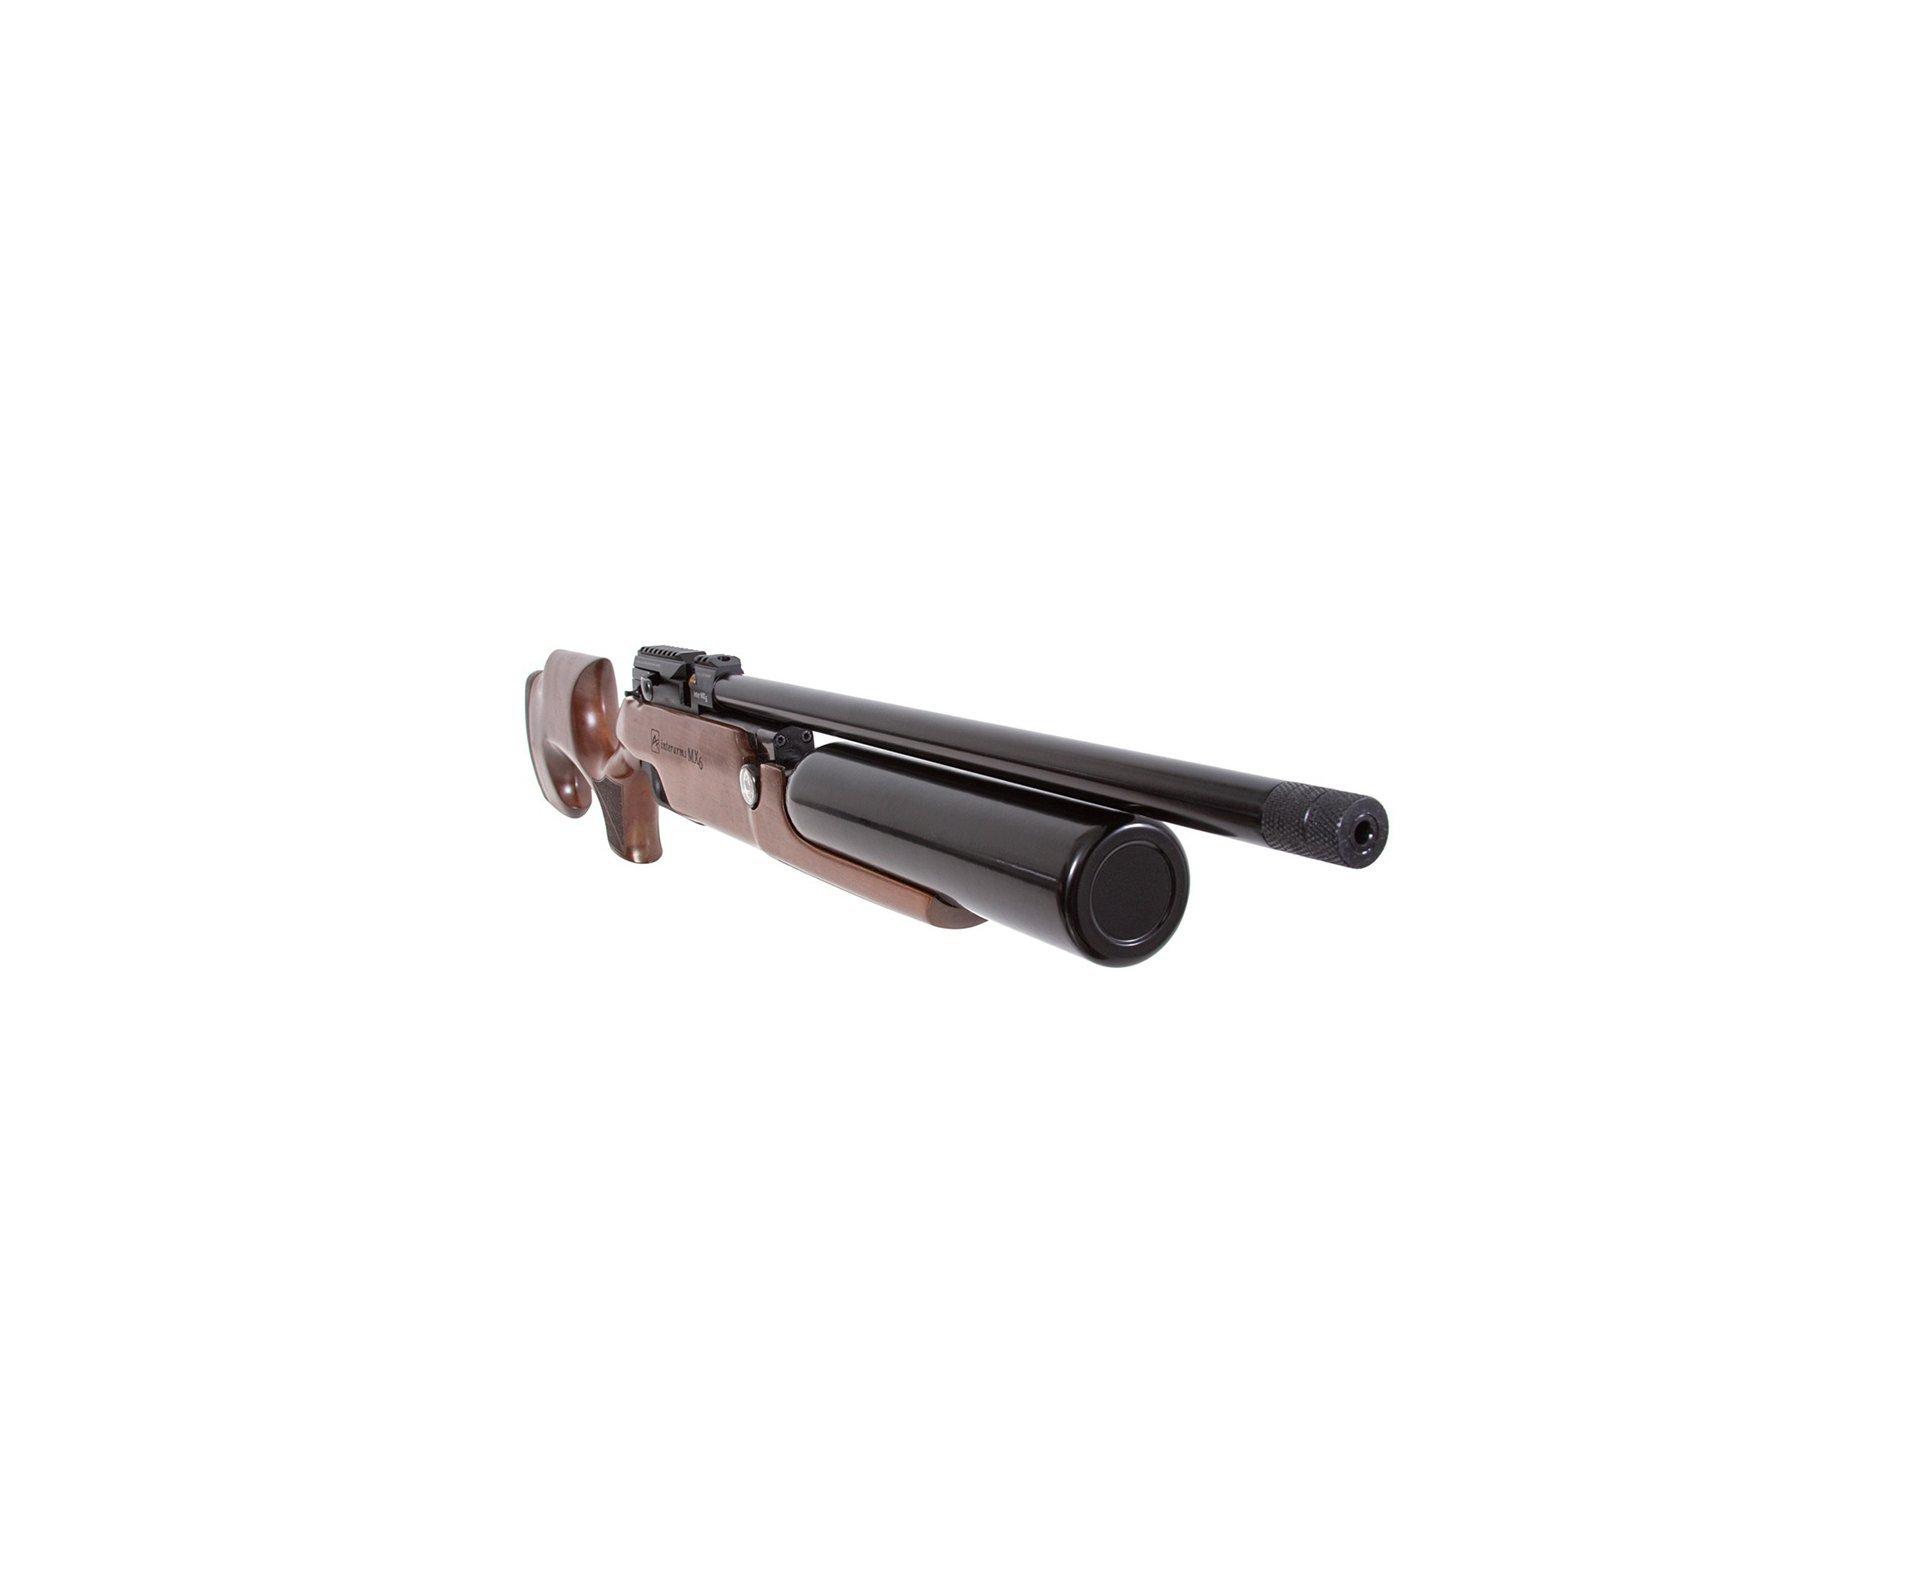 Artefato de Pressão PCP MX6 Matte Black Wood Regulated 5.5mm Aselkon